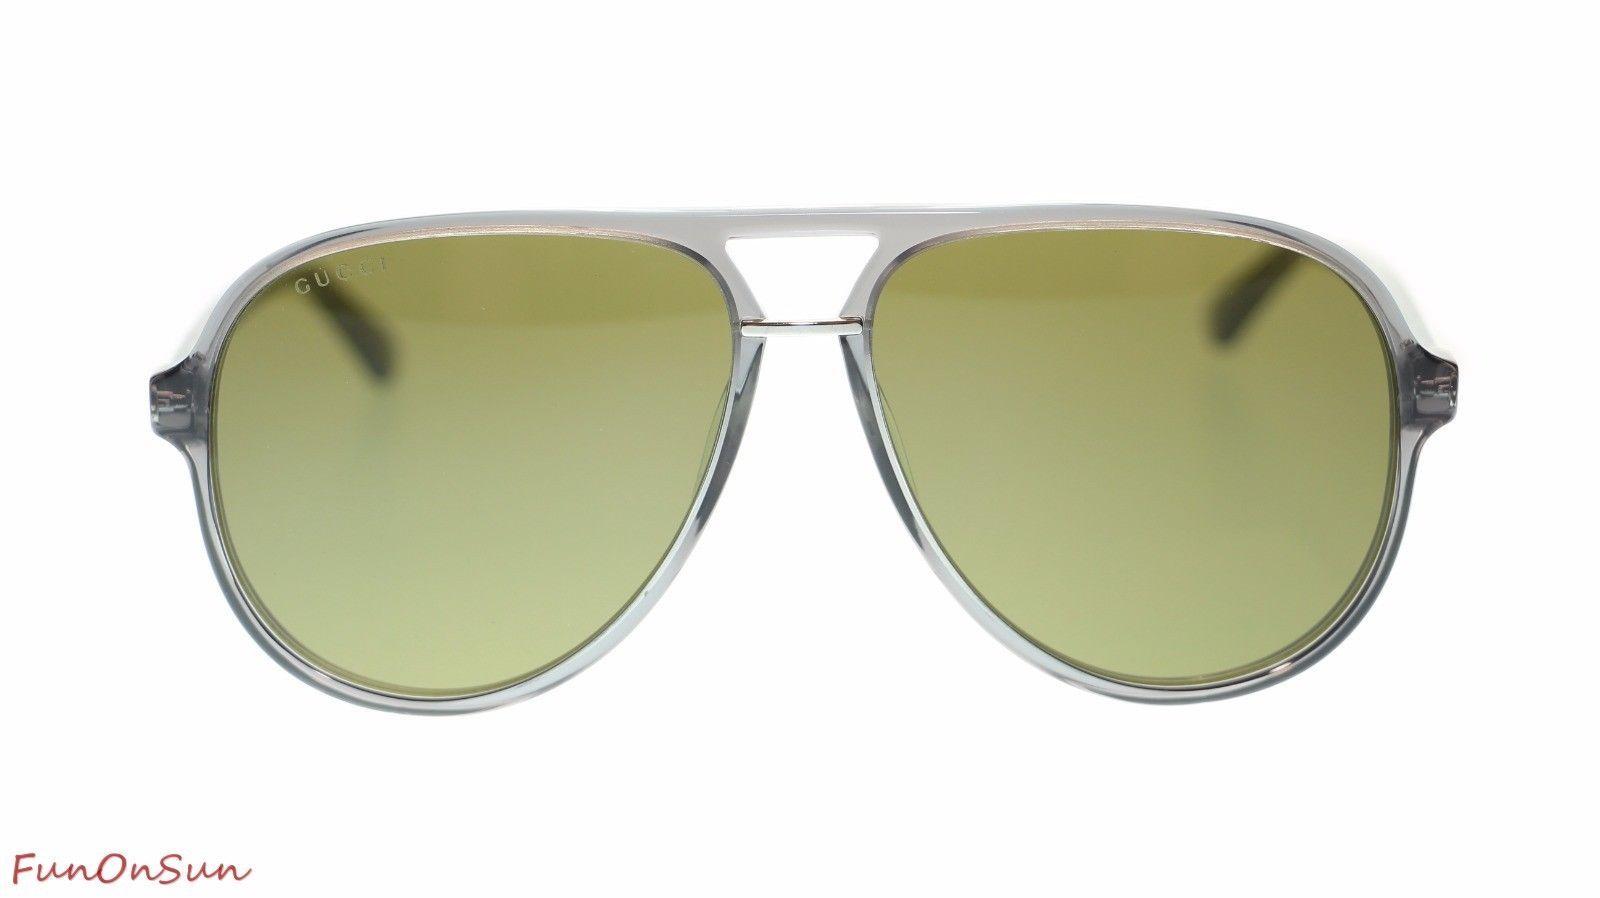 7908cc6b6b Gucci Men s Aviator Sunglasses GG0015S 005 and 11 similar items. 57